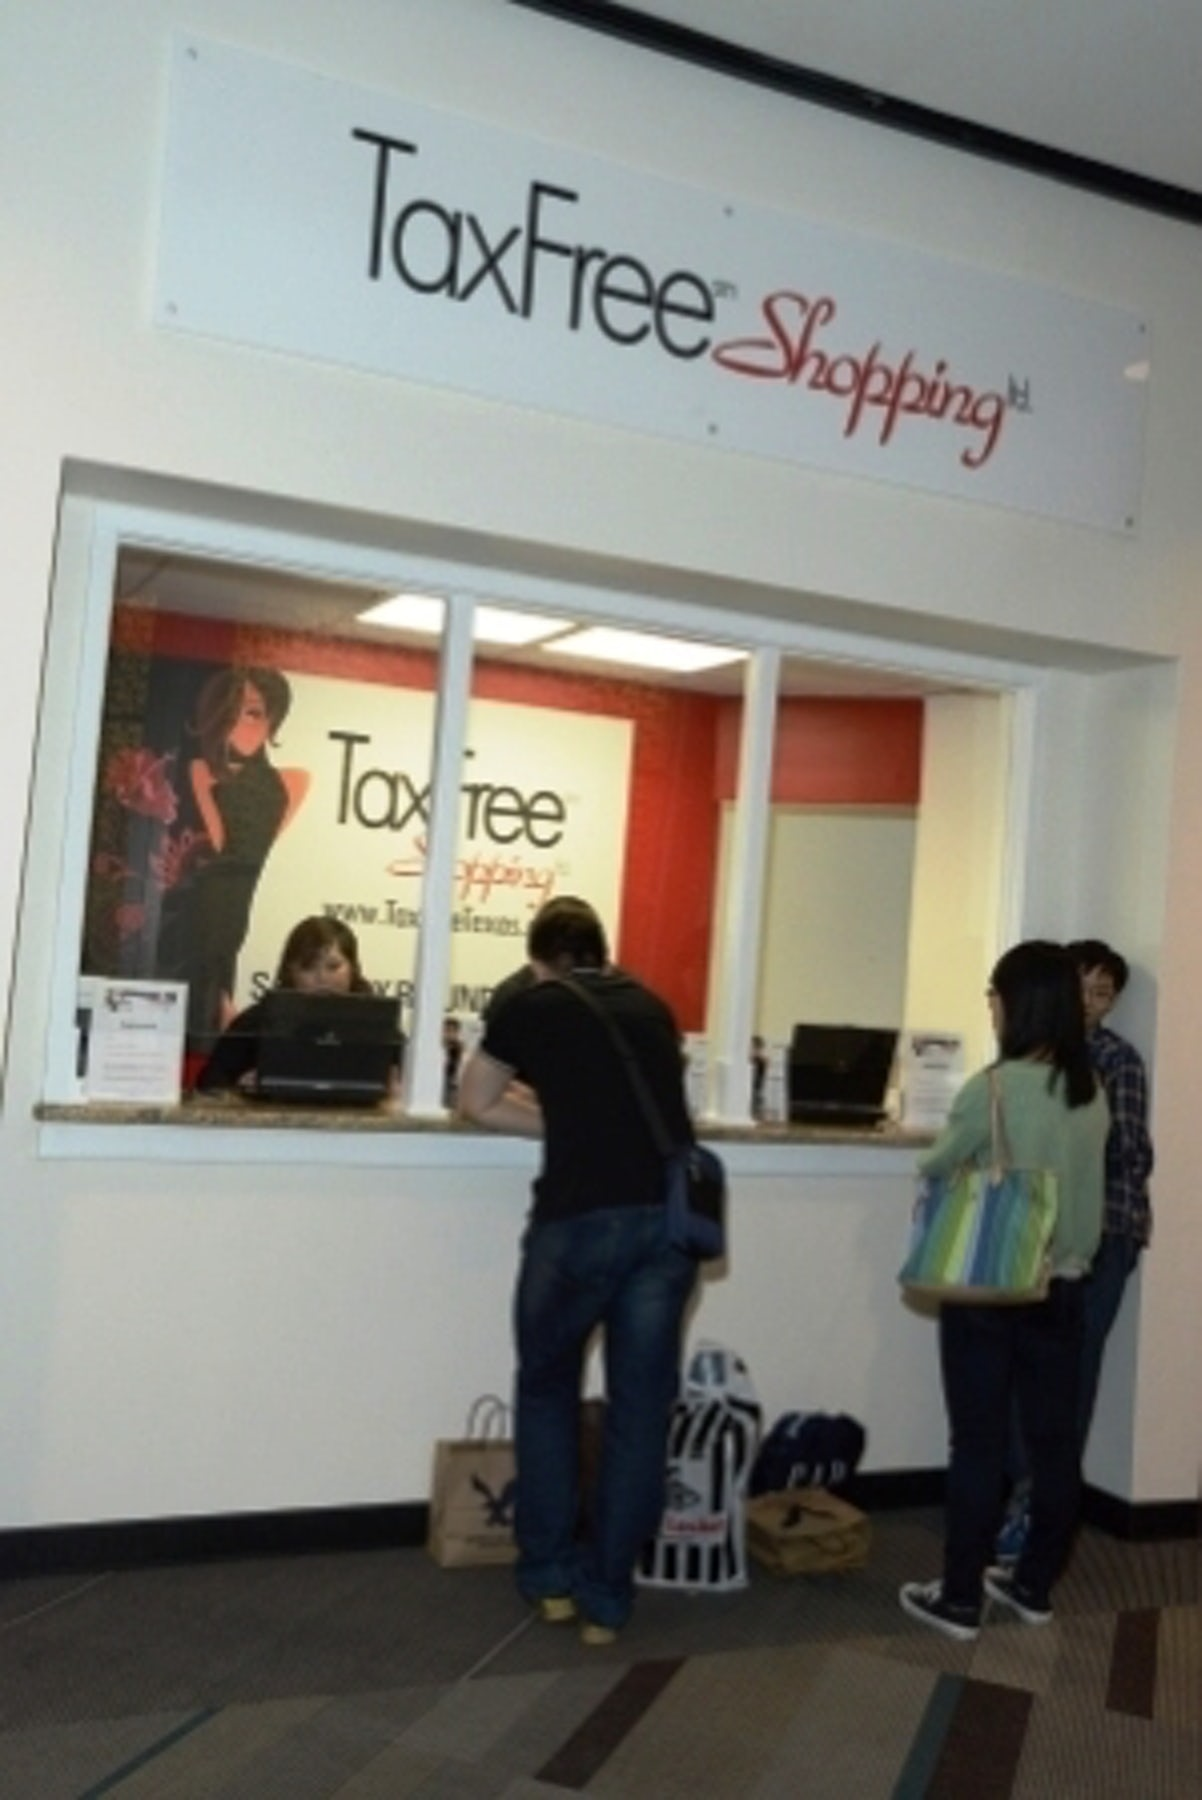 TaxFree Shopping, LTD. in Beyond Dallas